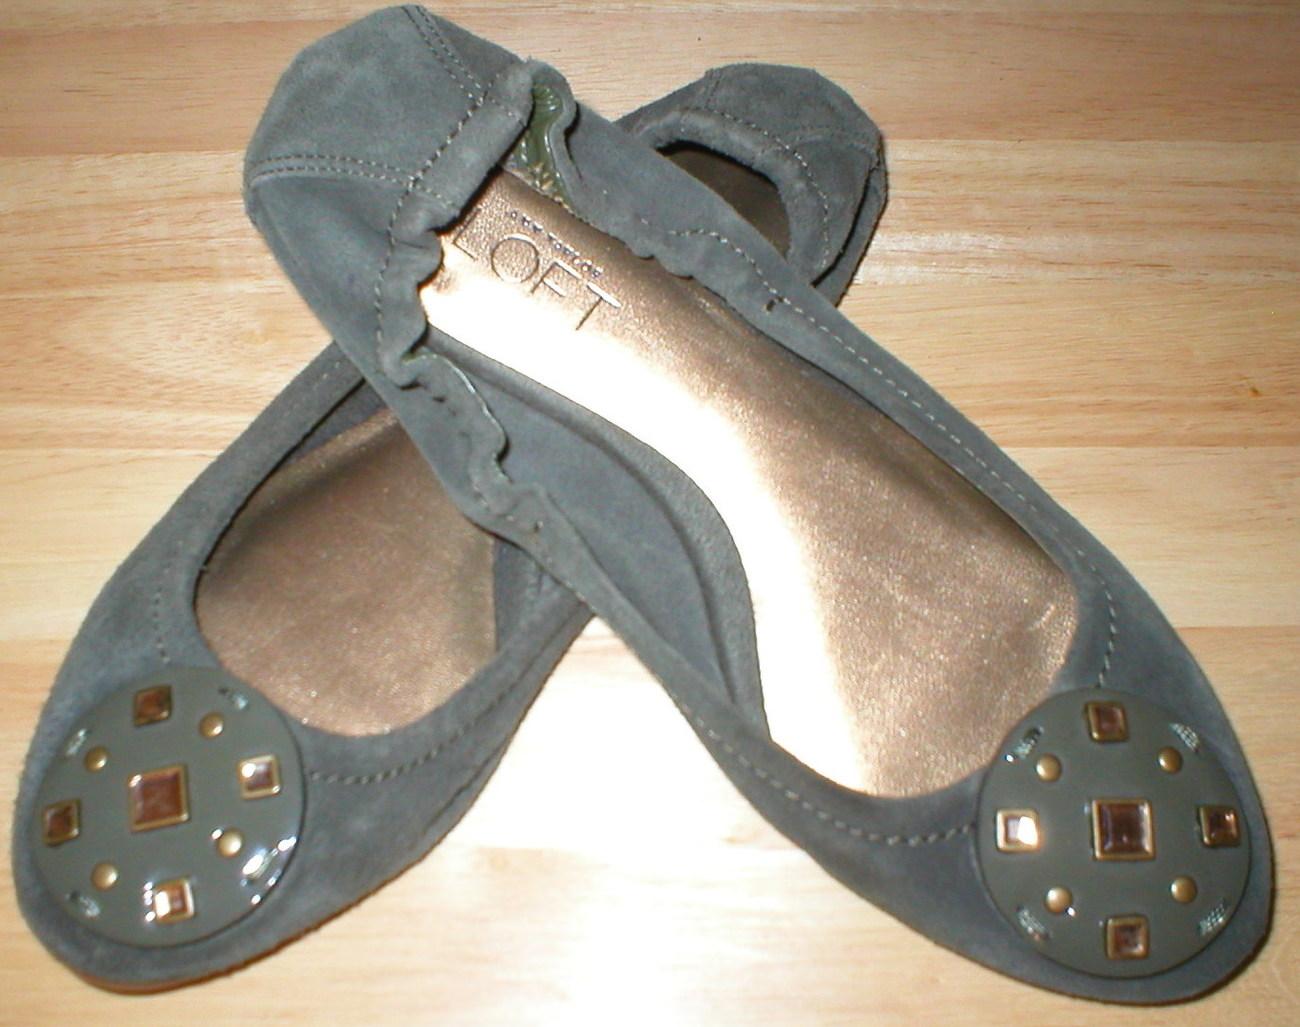 New Ann Taylor Loft Women's Leather Suede Flats Shoes 6 Dark Green  - $10.00